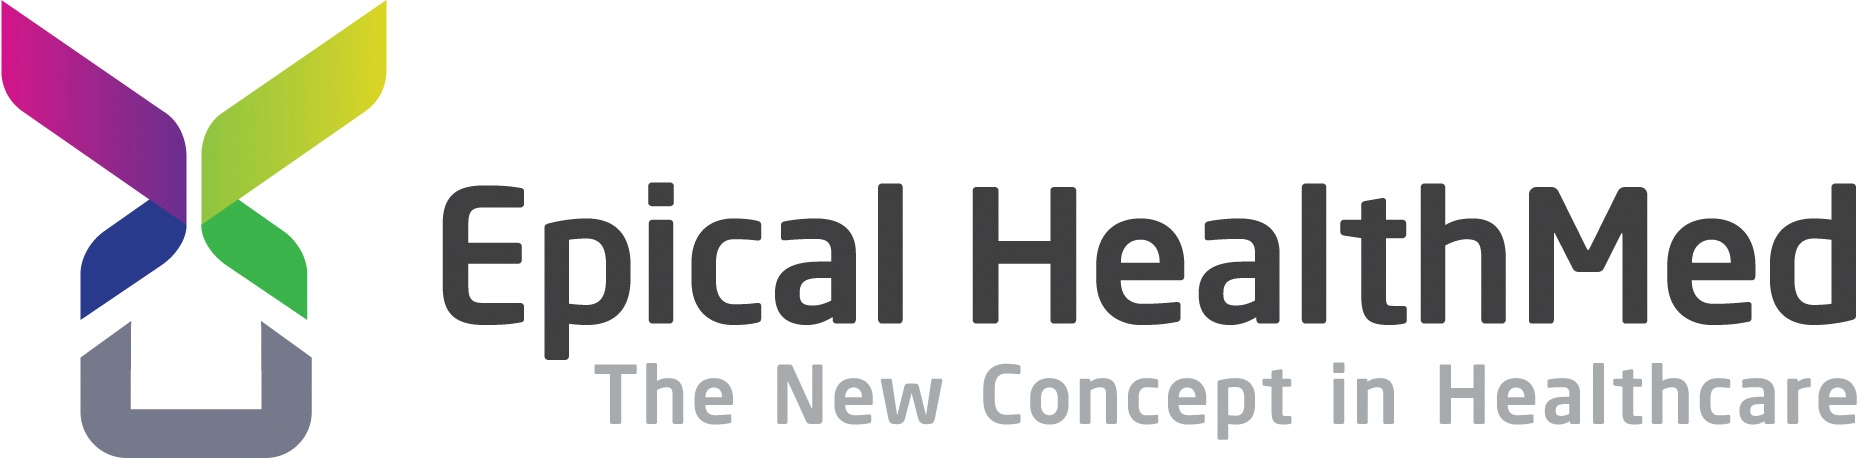 Epical HealthMed Logo